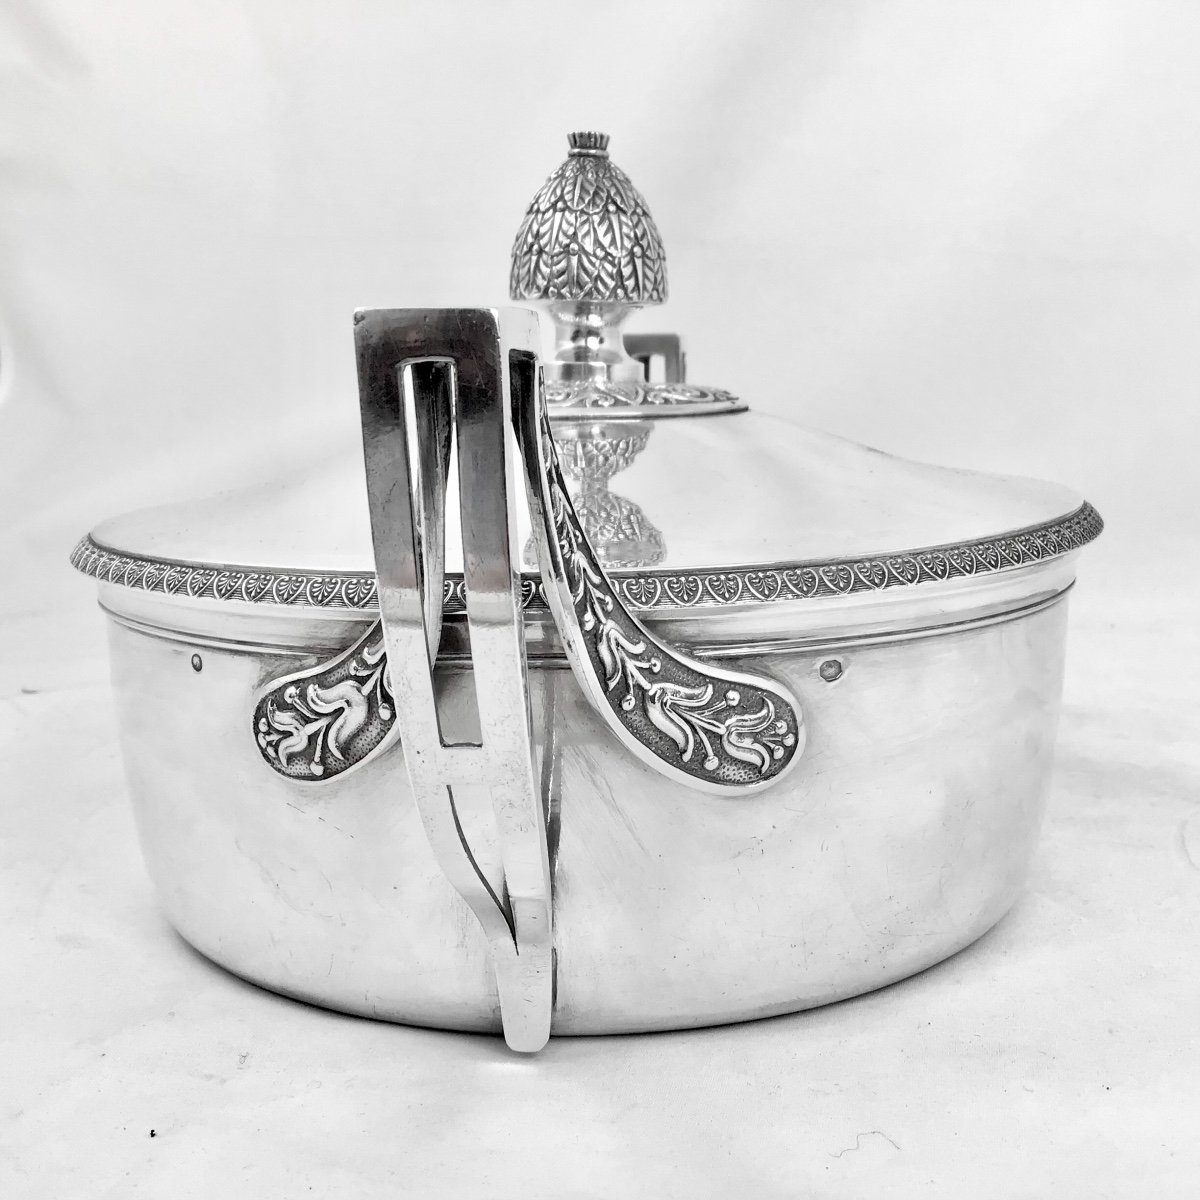 Sterling Silver Vegetable Dish, Empire Period, Paris 1809-1819, J.-b. Lefranc-photo-3